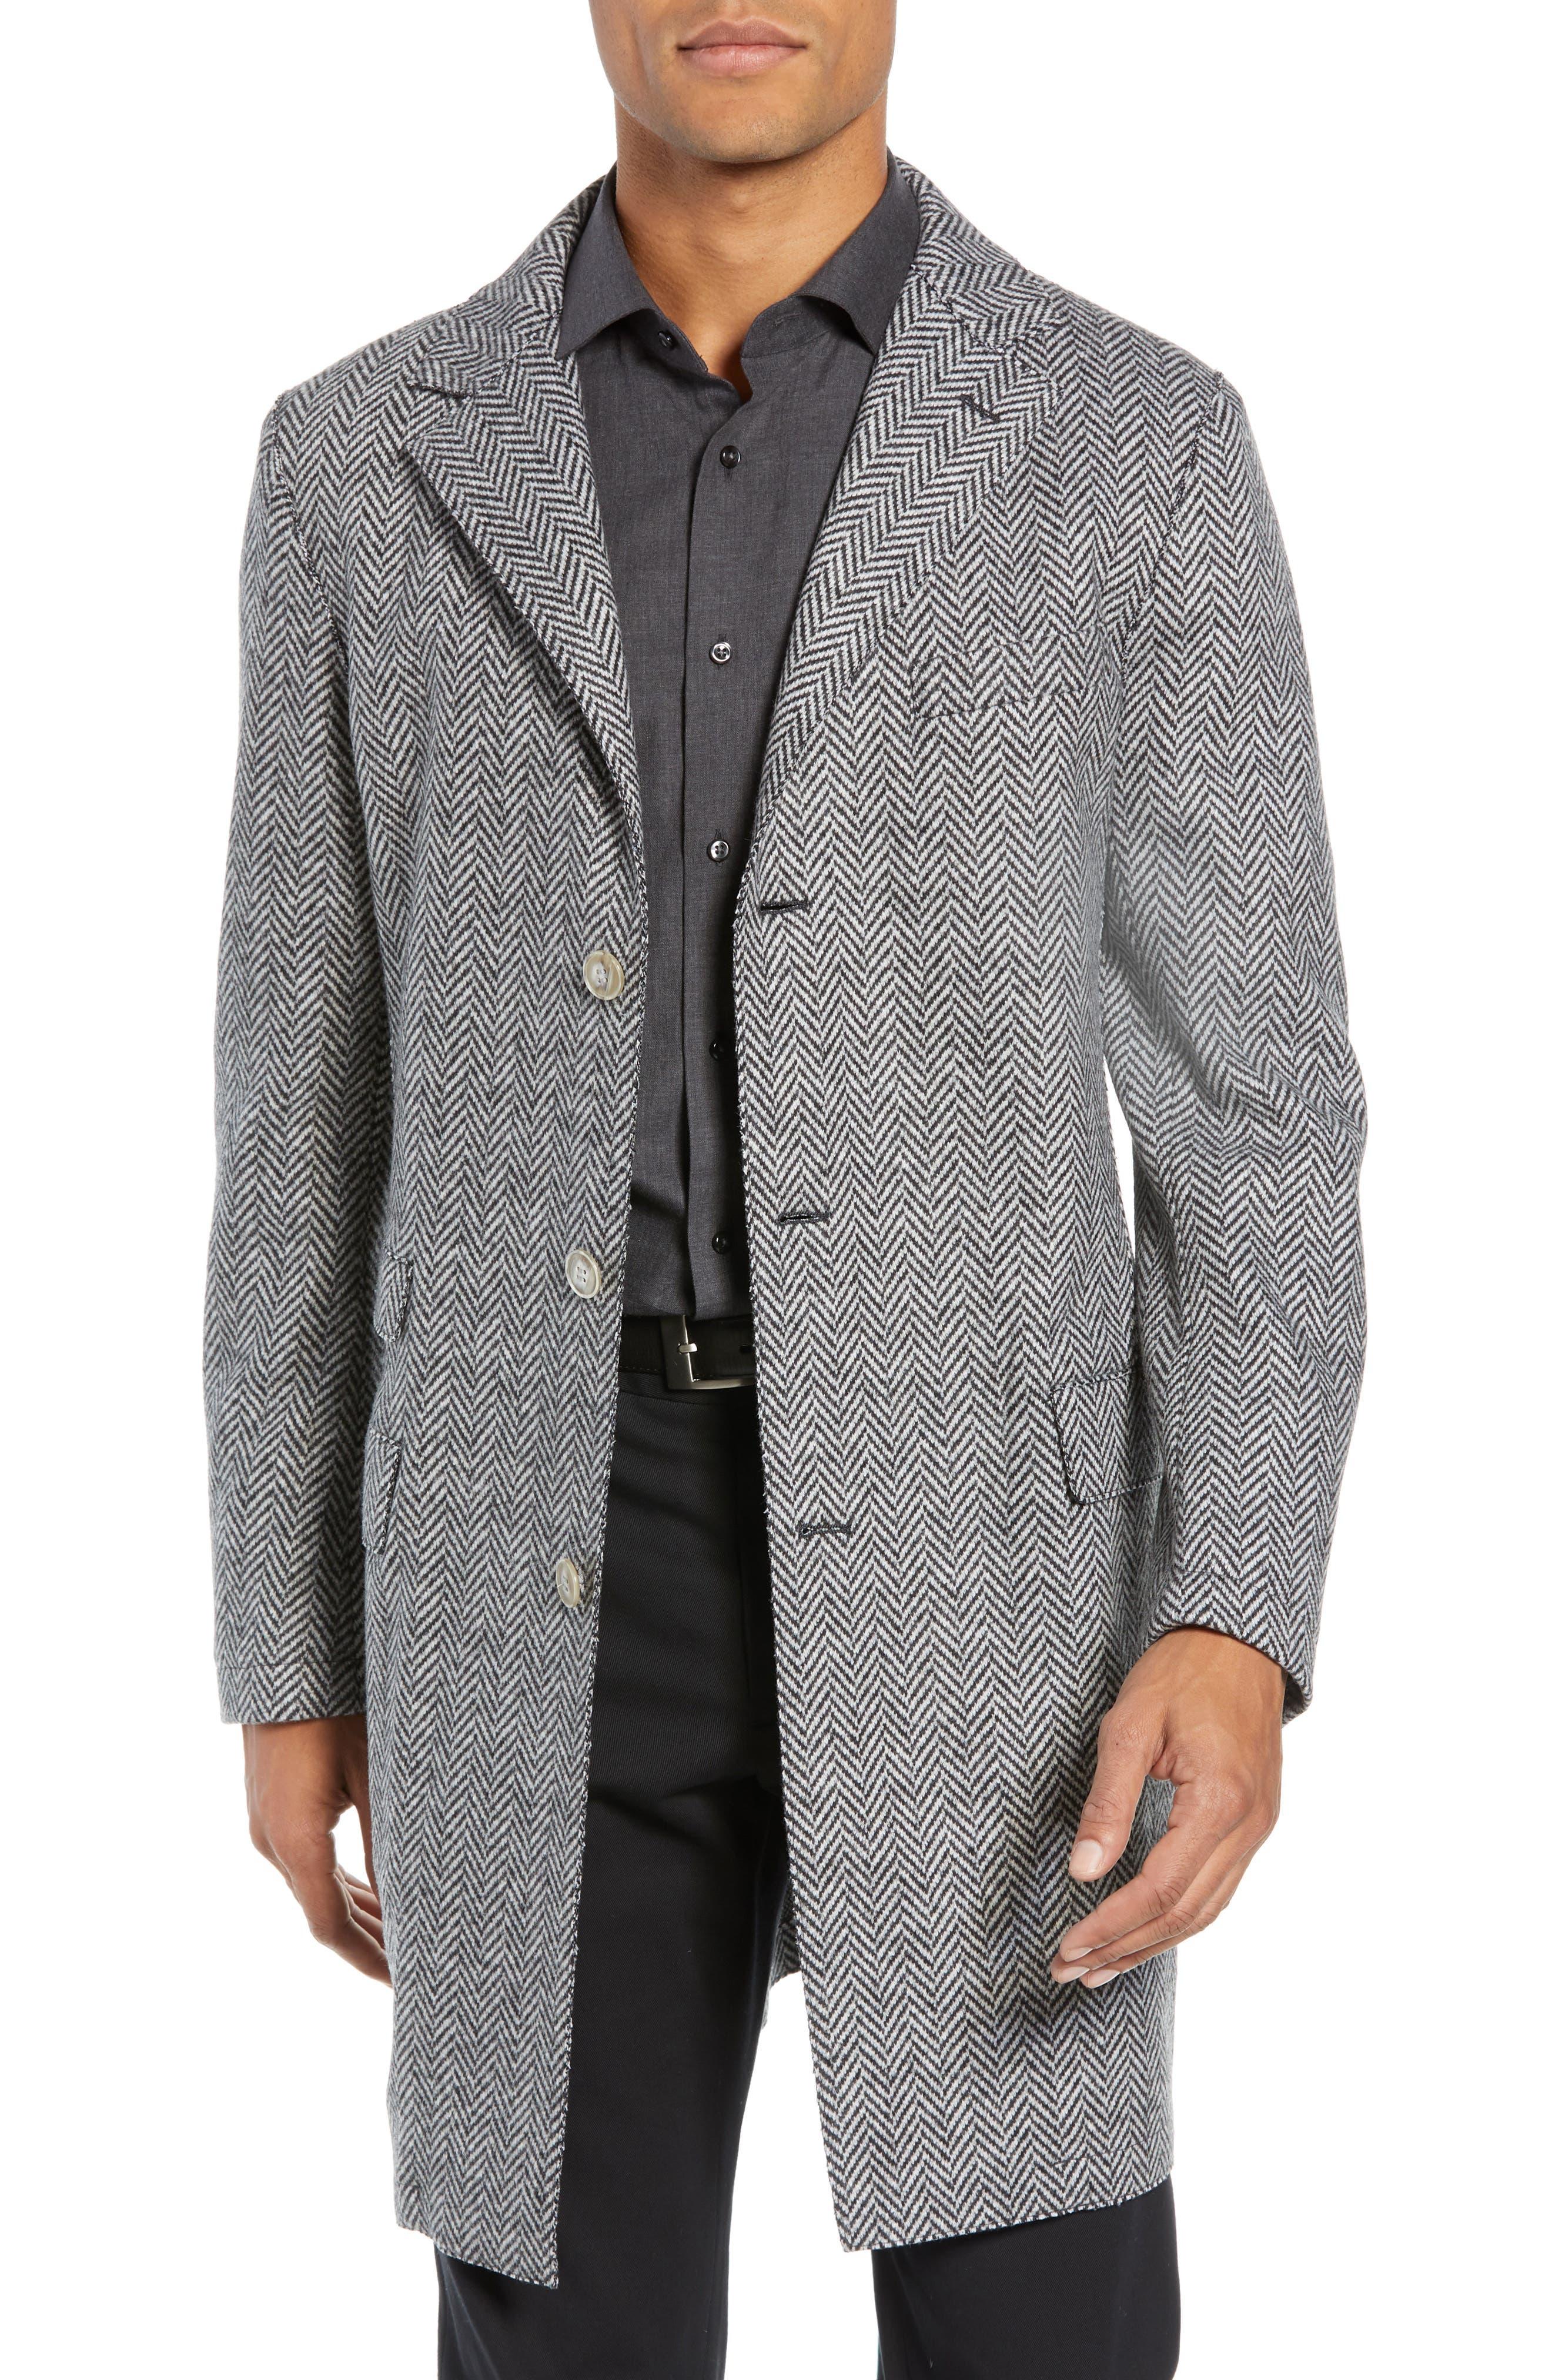 Trim Fit Wool Blend Top Coat,                             Main thumbnail 1, color,                             GREY